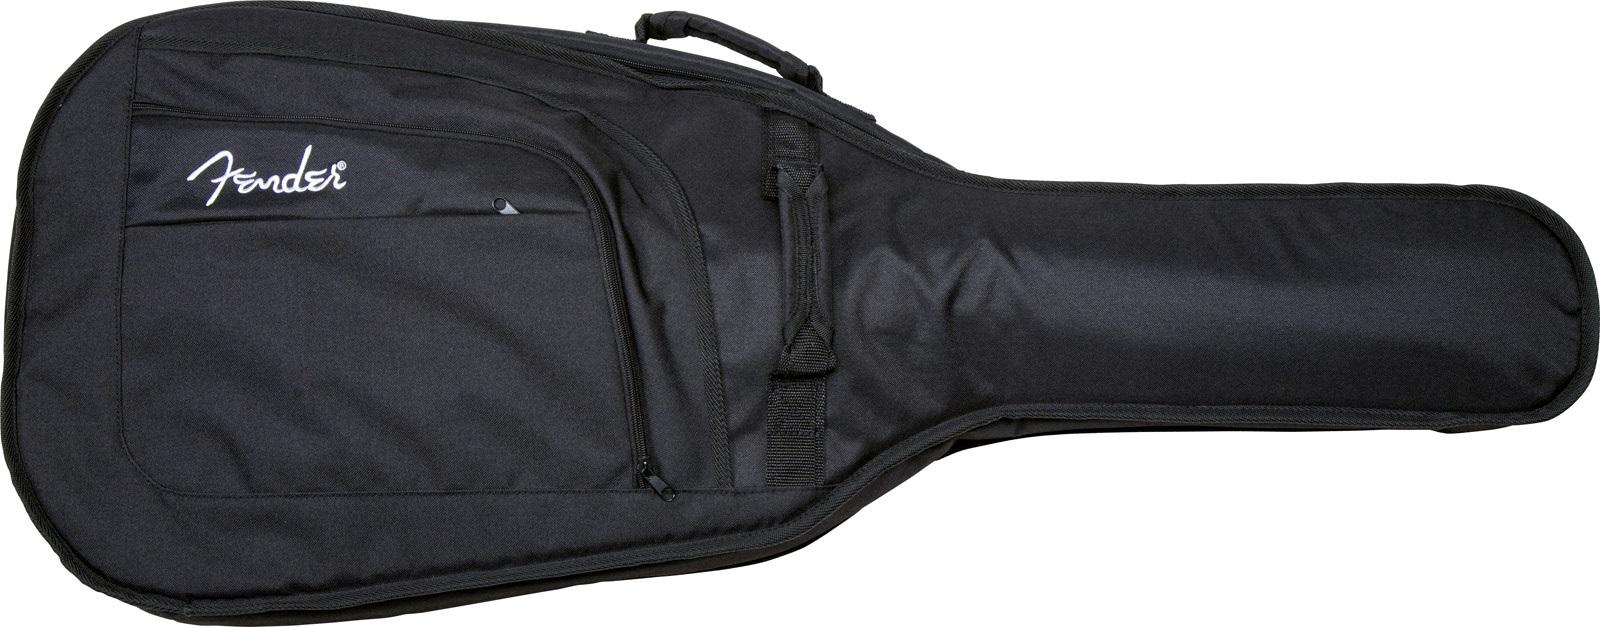 Fender Urban Series, Stratocaster®/Telecaster® Gig Bag